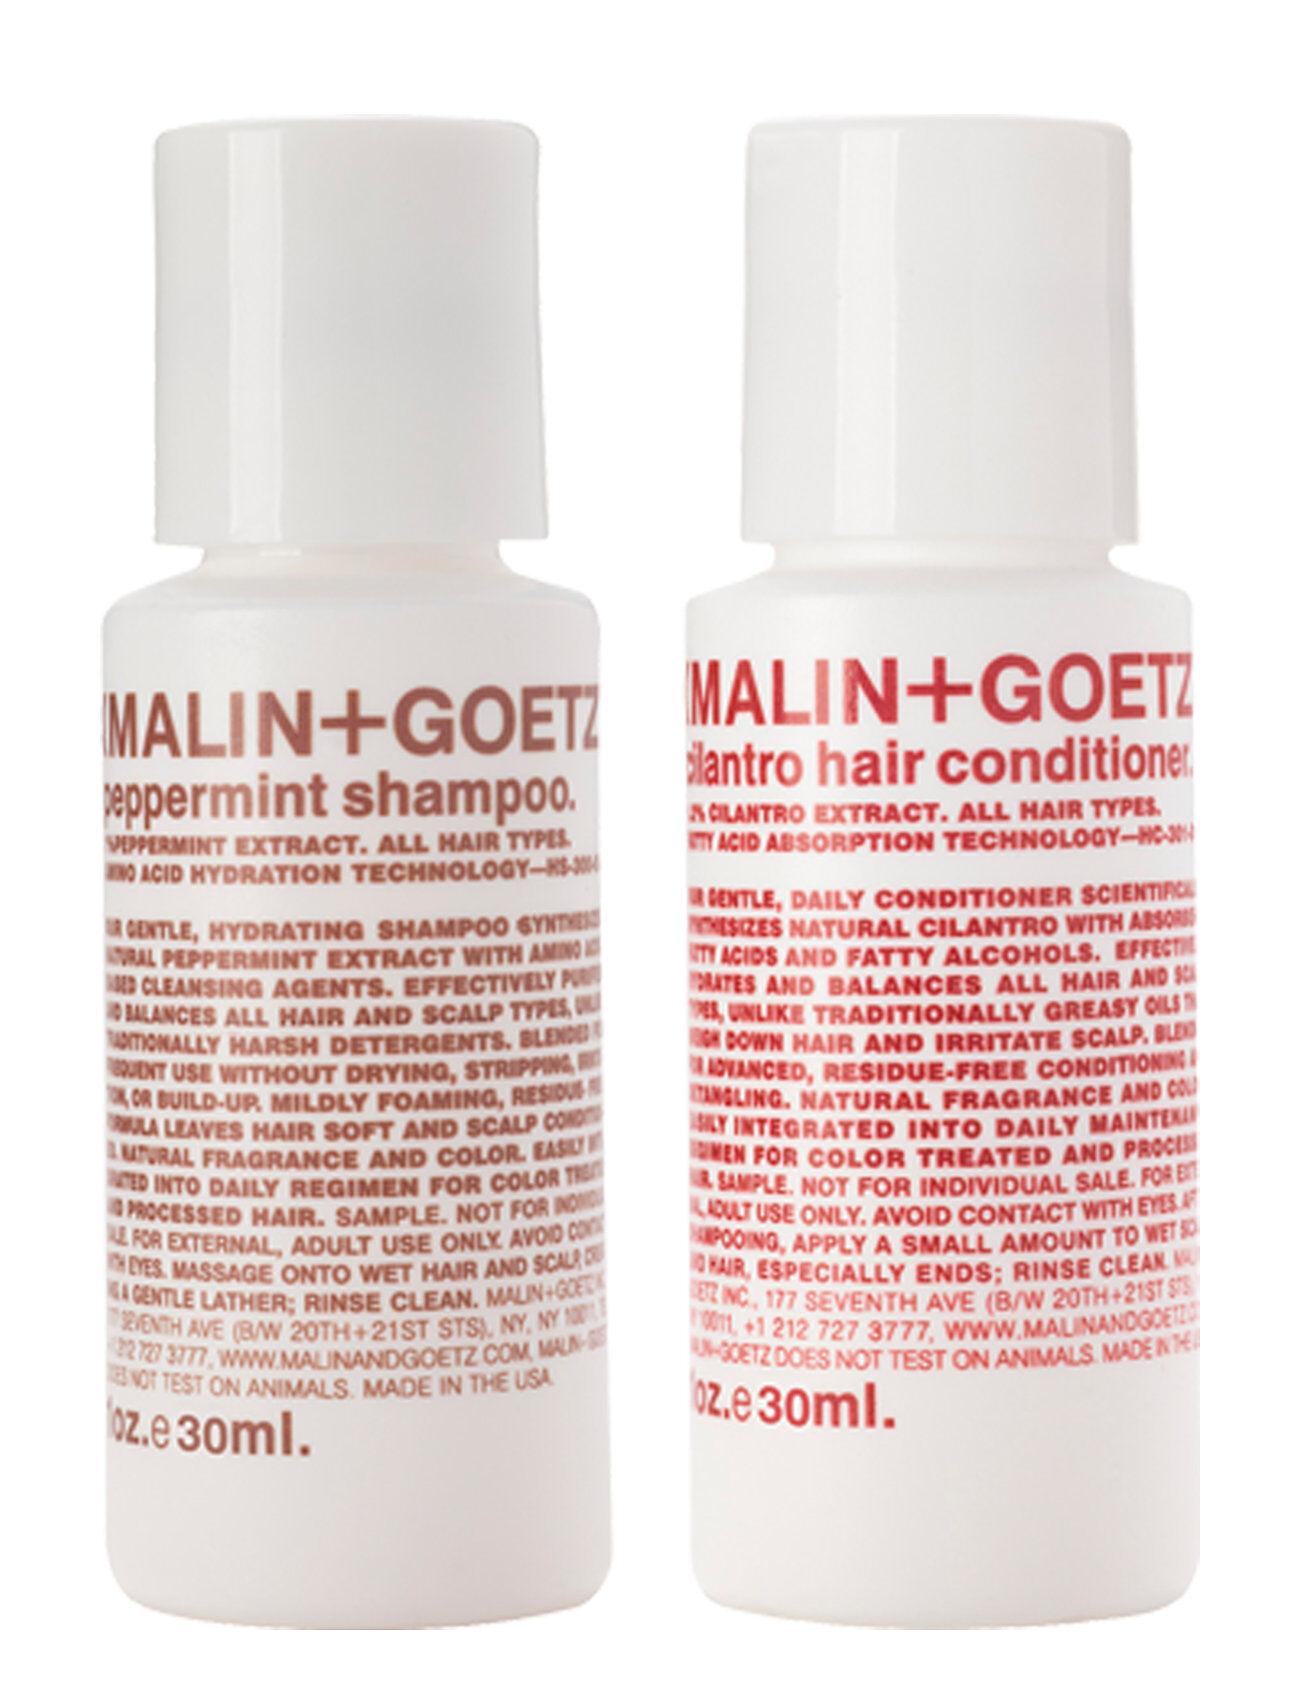 MALIN+GOETZ Hair Essentials Duo Lahjapakkaus Nude MALIN+GOETZ